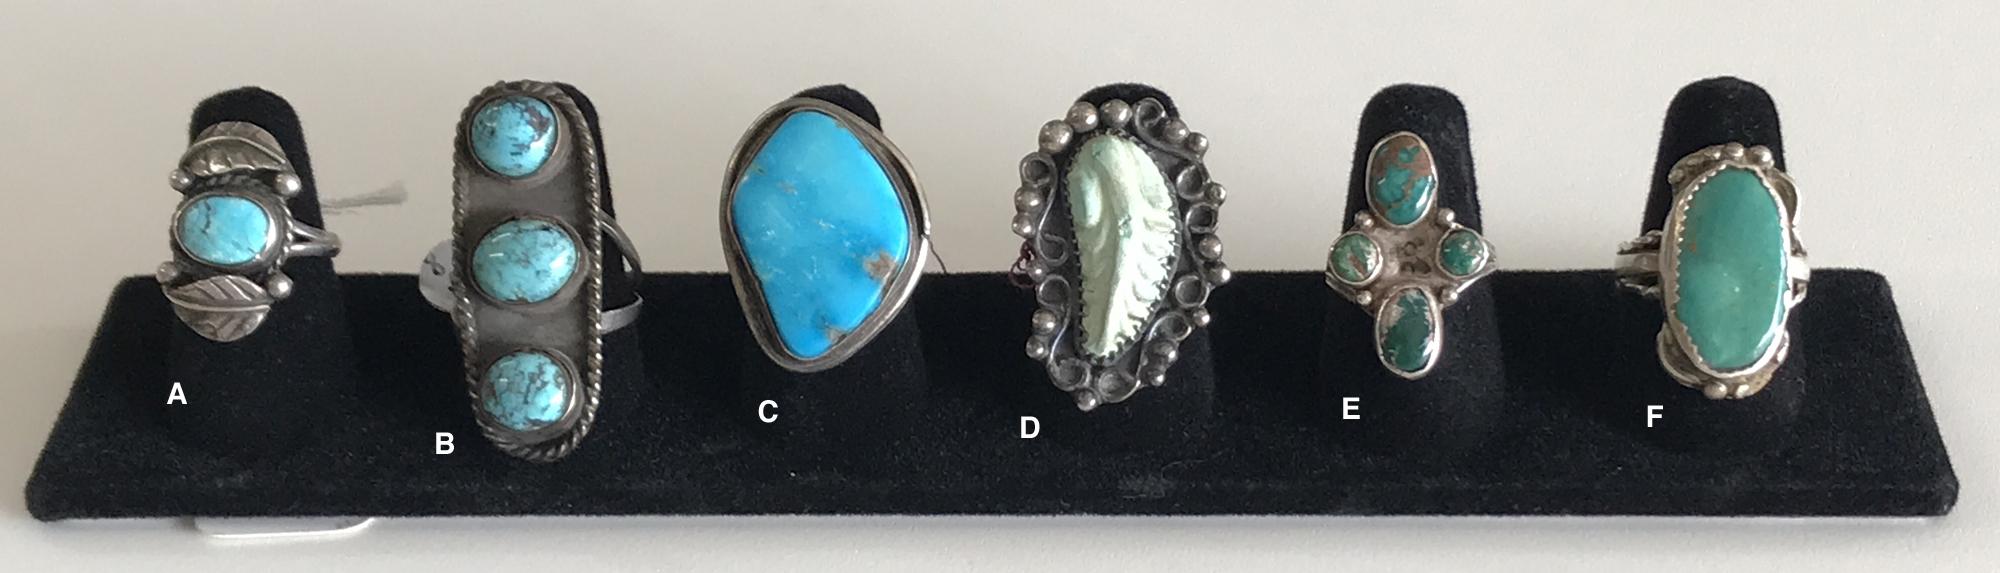 Native American Jewelry, Pierson Gallery, American Fine Art